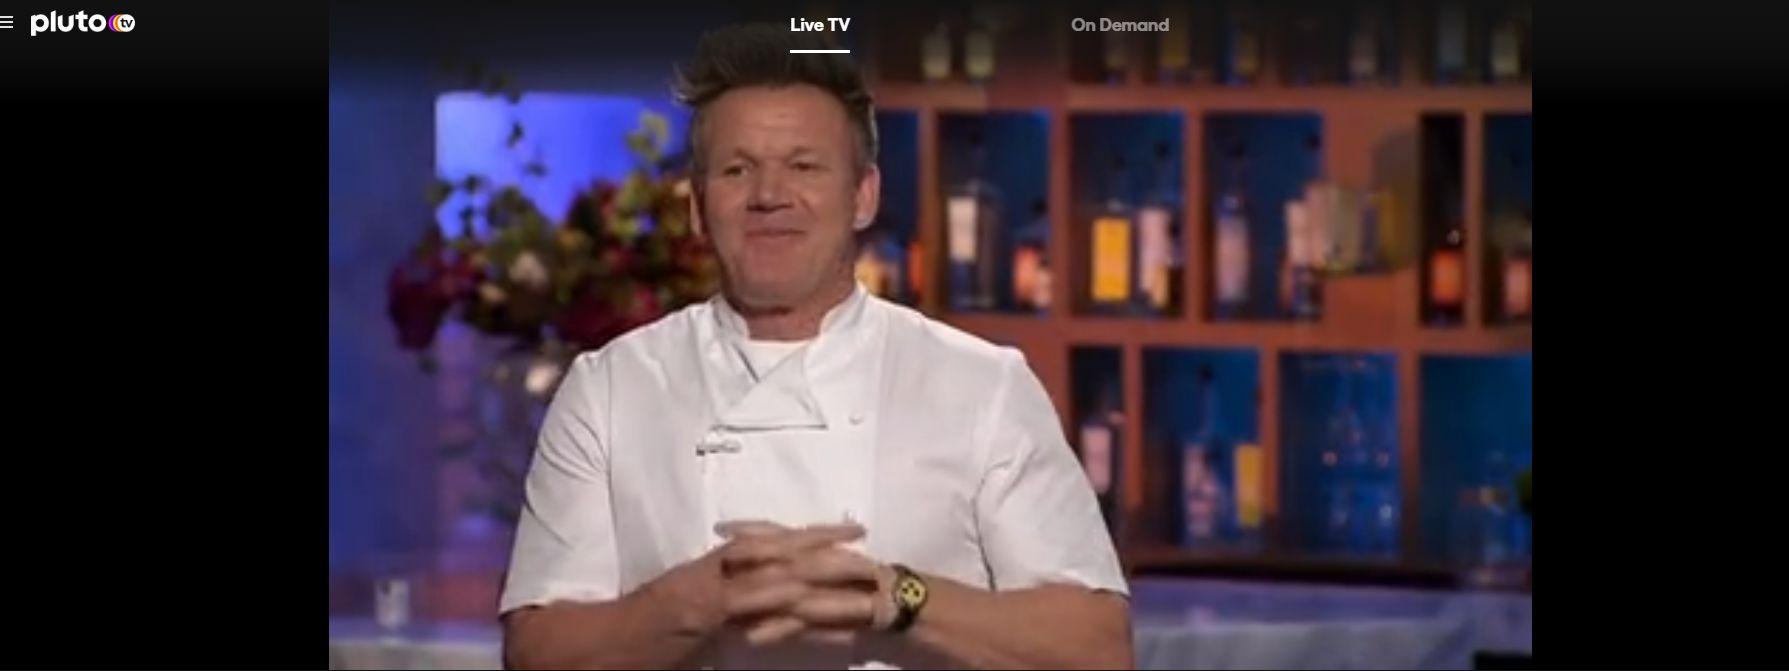 hells kitchen pluto